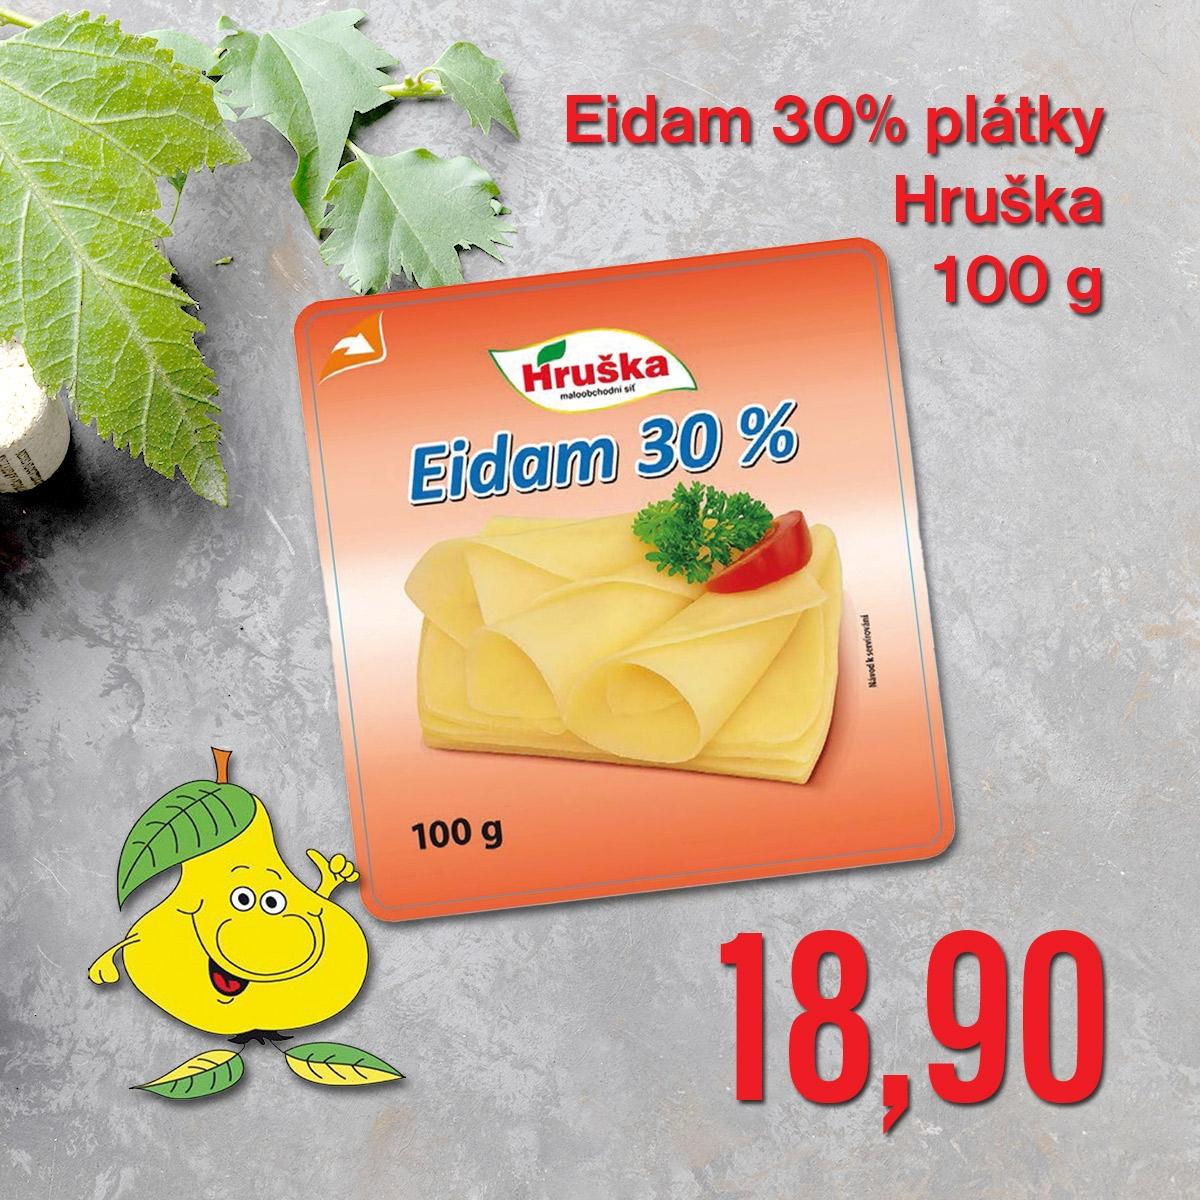 Eidam 30% plátky Hruška 100 g